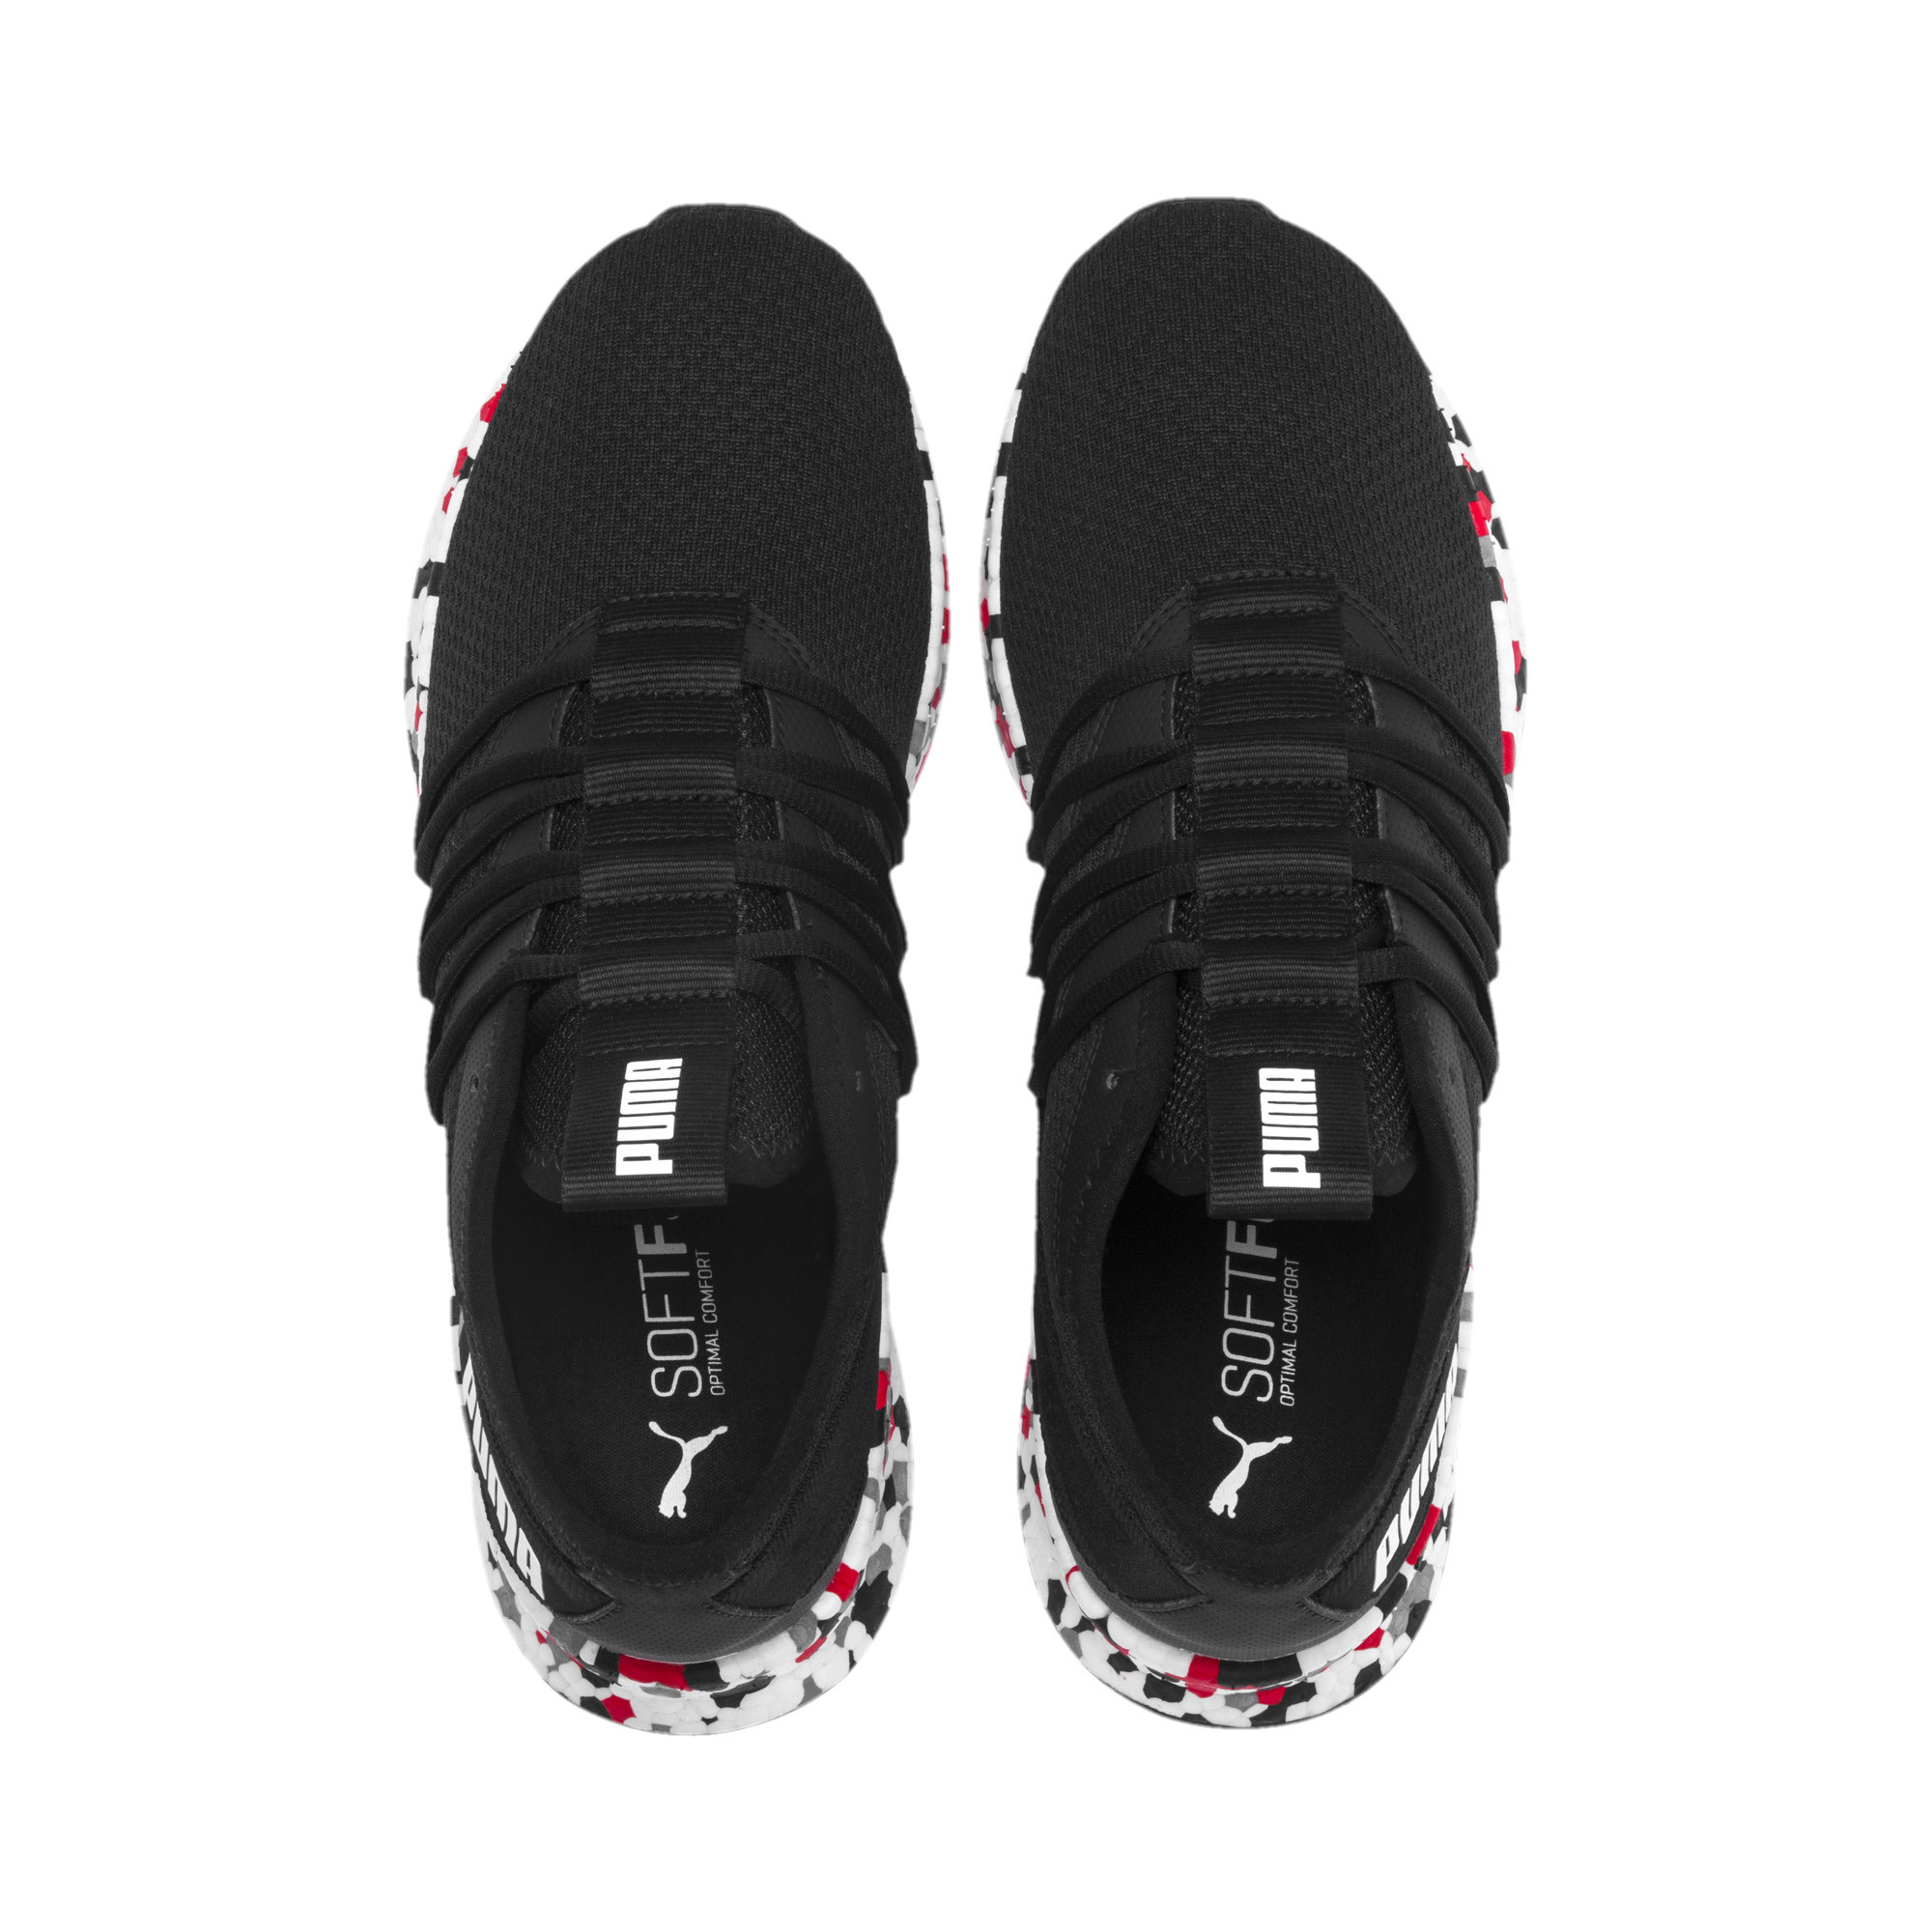 PUMA-NRGY-Star-Multi-Men-039-s-Running-Shoes-Unisex-Shoe-Running thumbnail 8